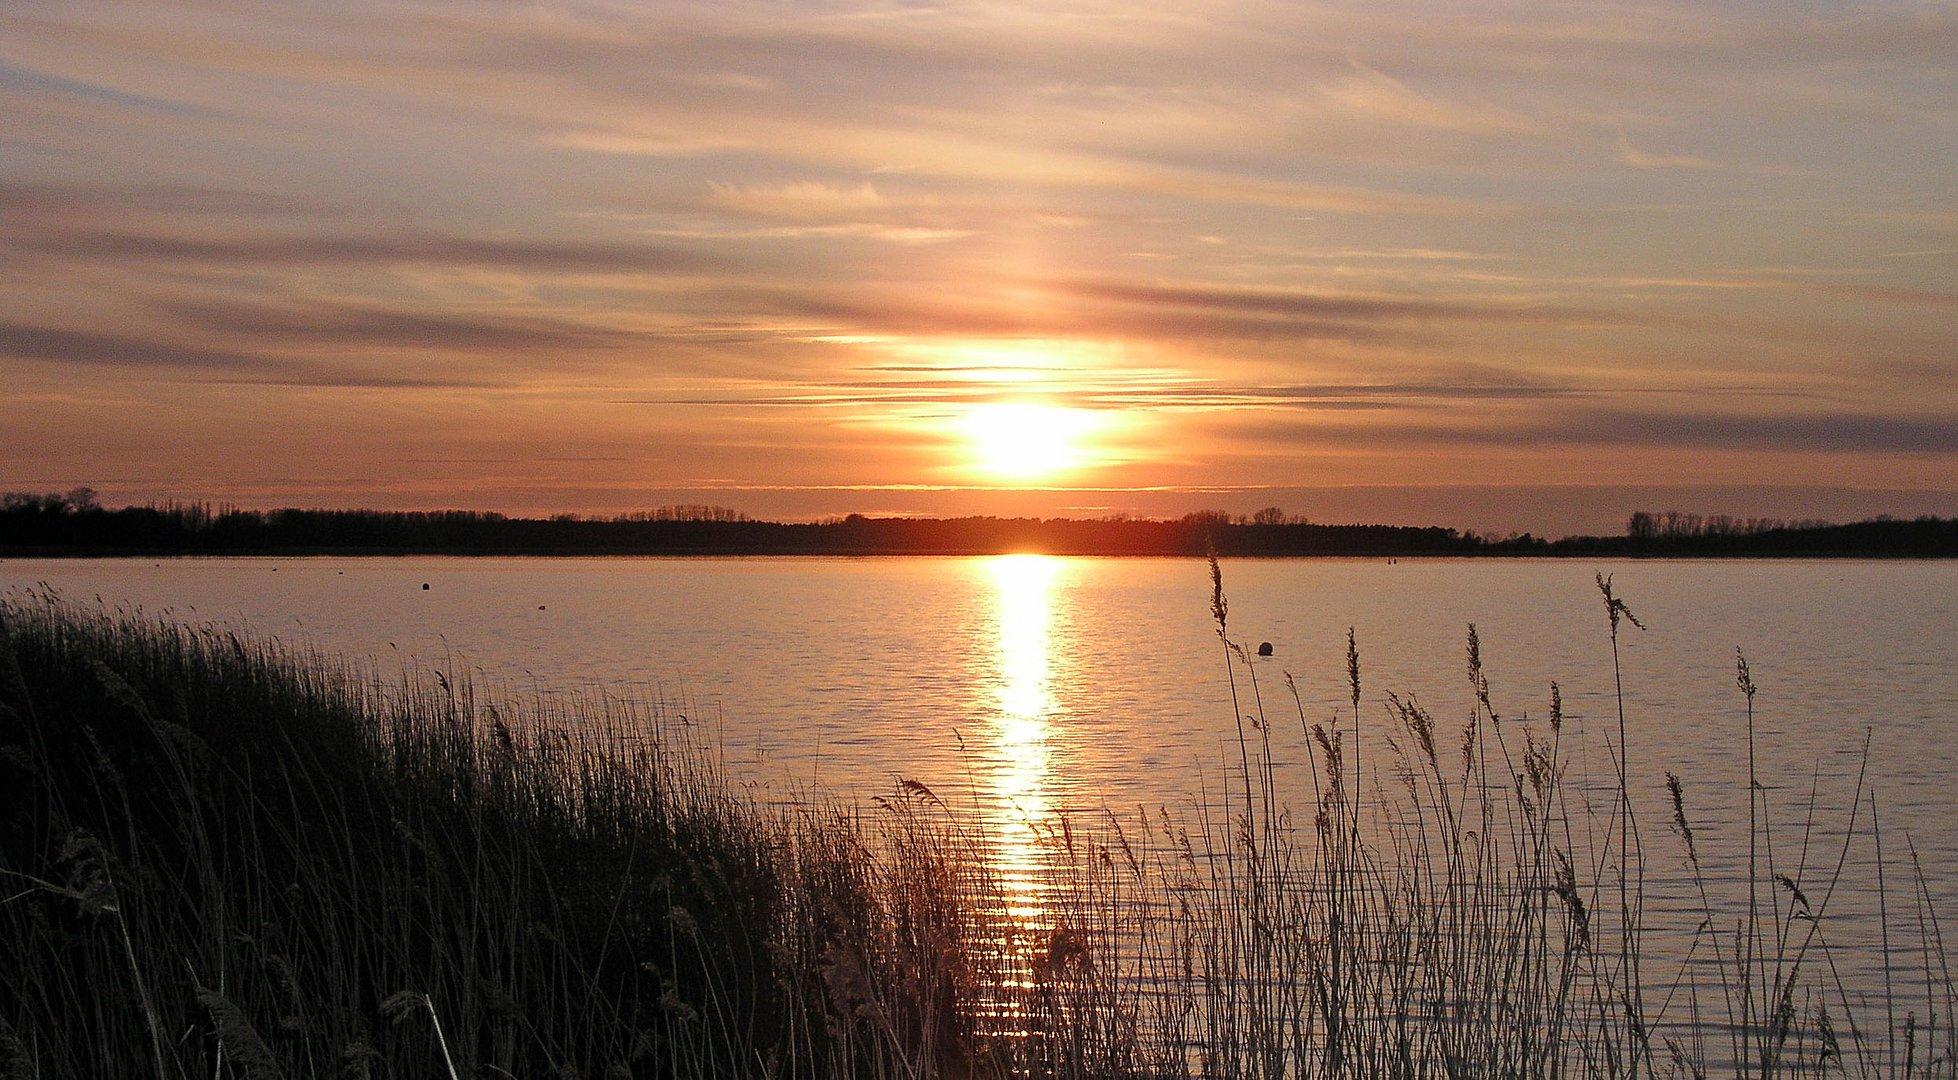 Sonnenuntergang am Ostersonntag